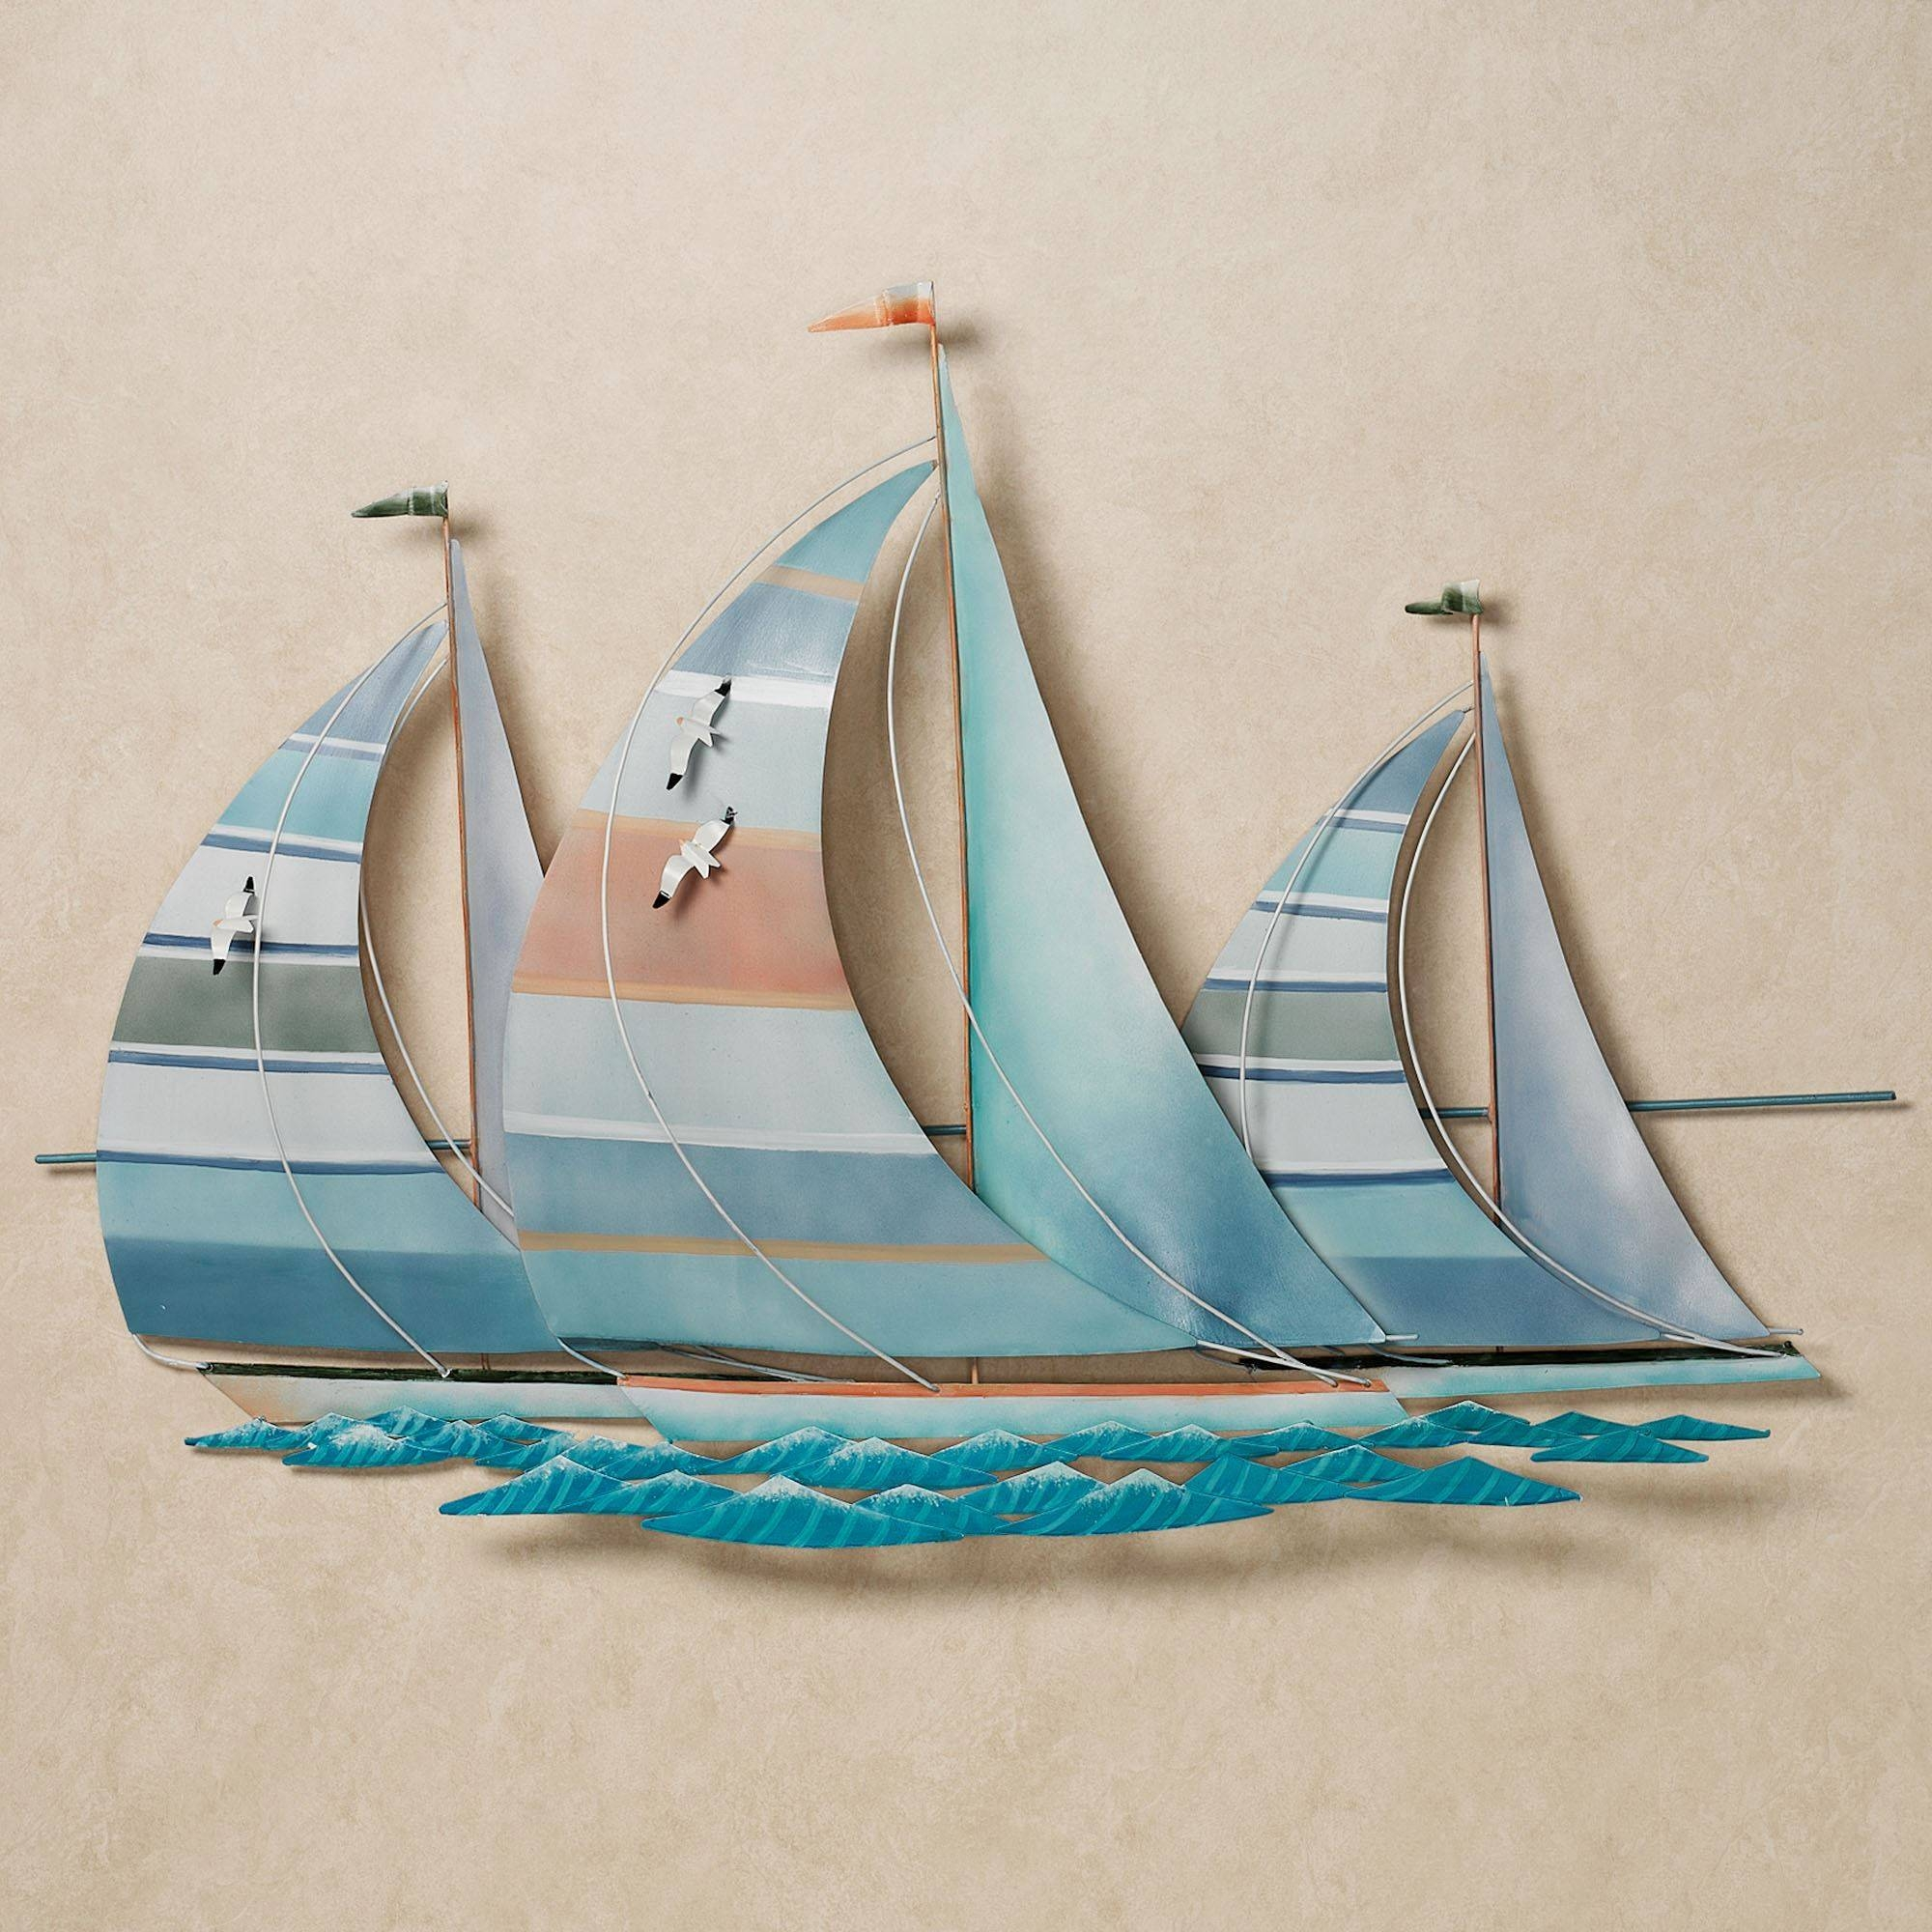 Regatta Finish Line Multi Cool Metal Sailboat Wall Sculpture For Latest Sailboat Metal Wall Art (Gallery 2 of 30)